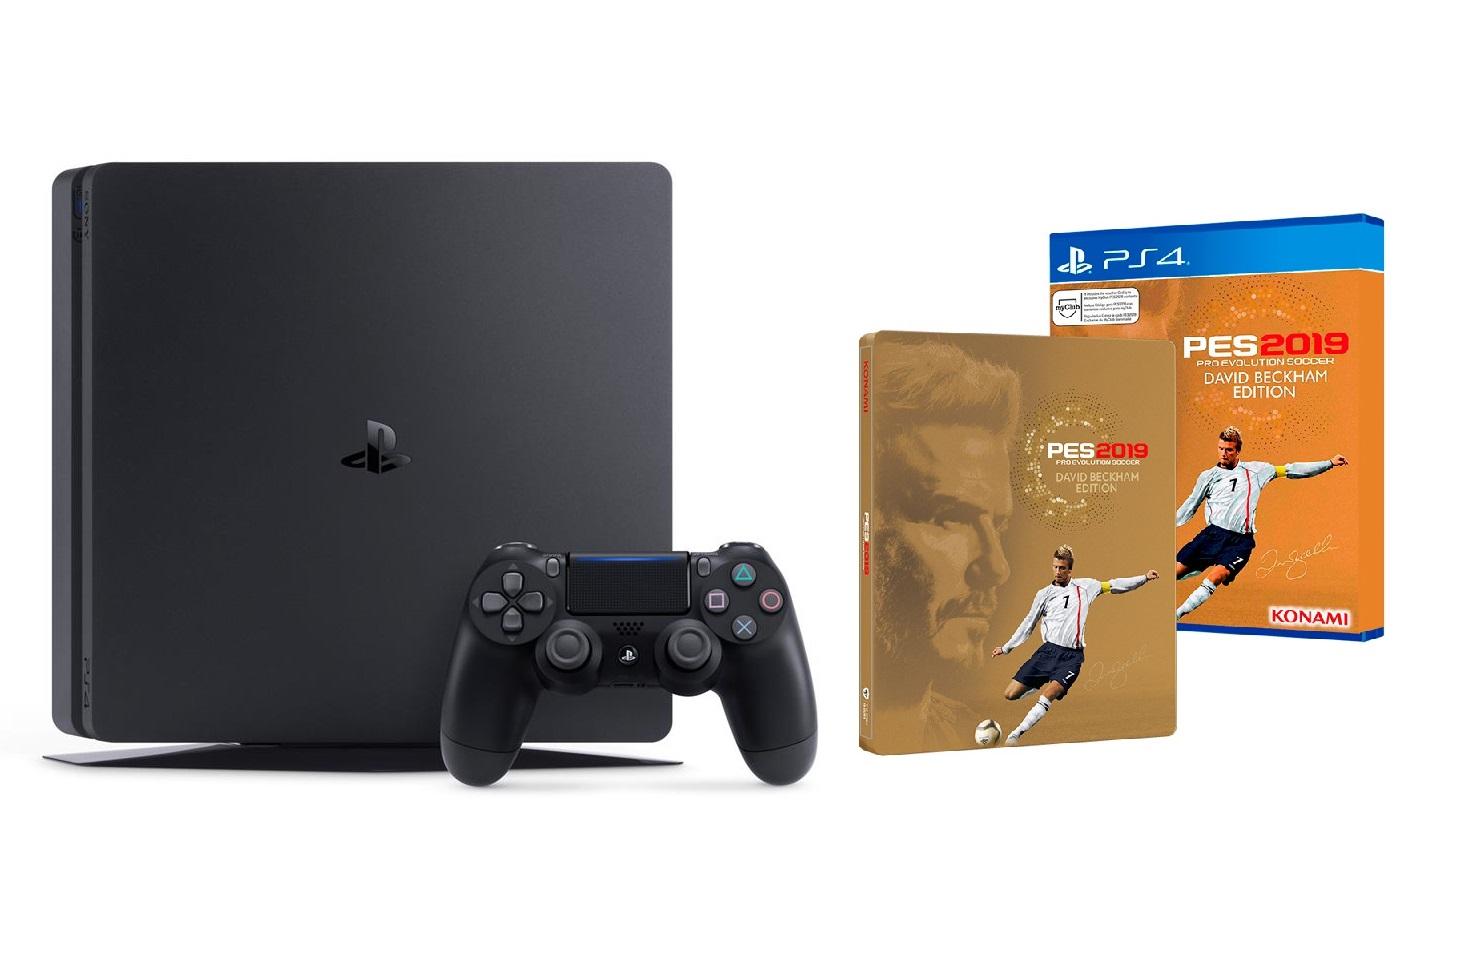 Máy PS4 Slim 500GB + PES 2019 David Beckham